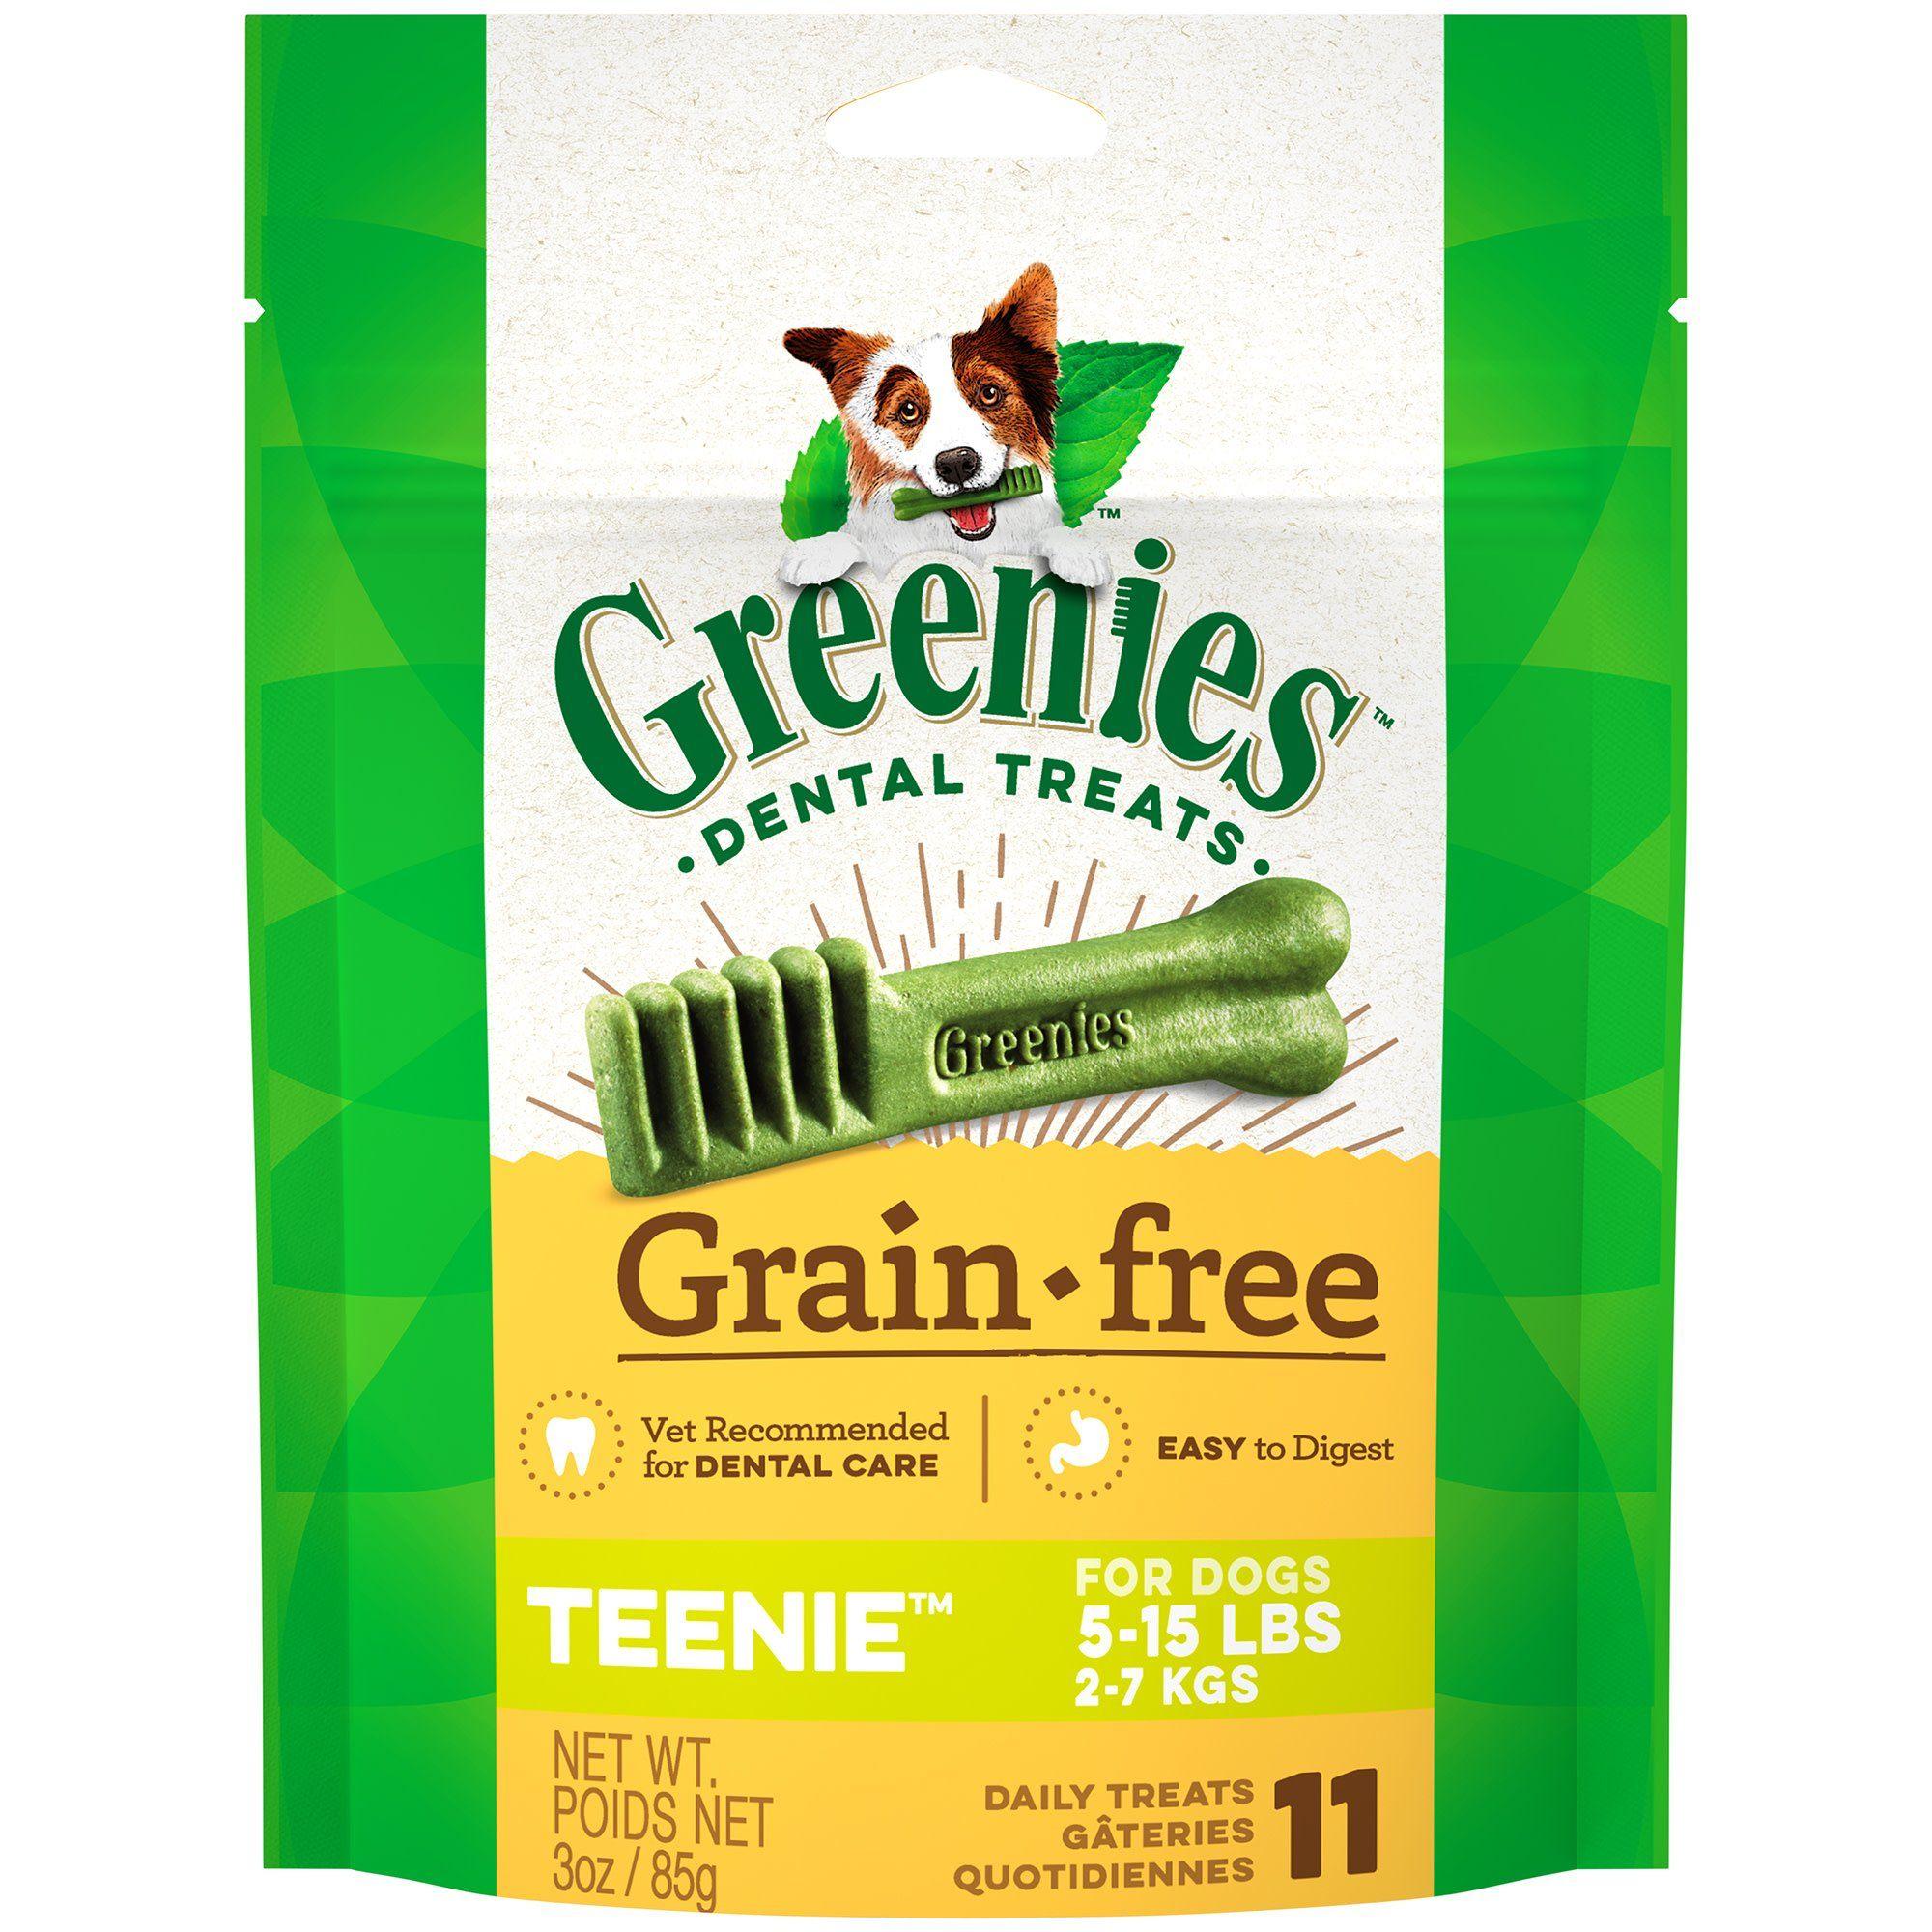 Greenies grain free teenie natural oral health dog dental